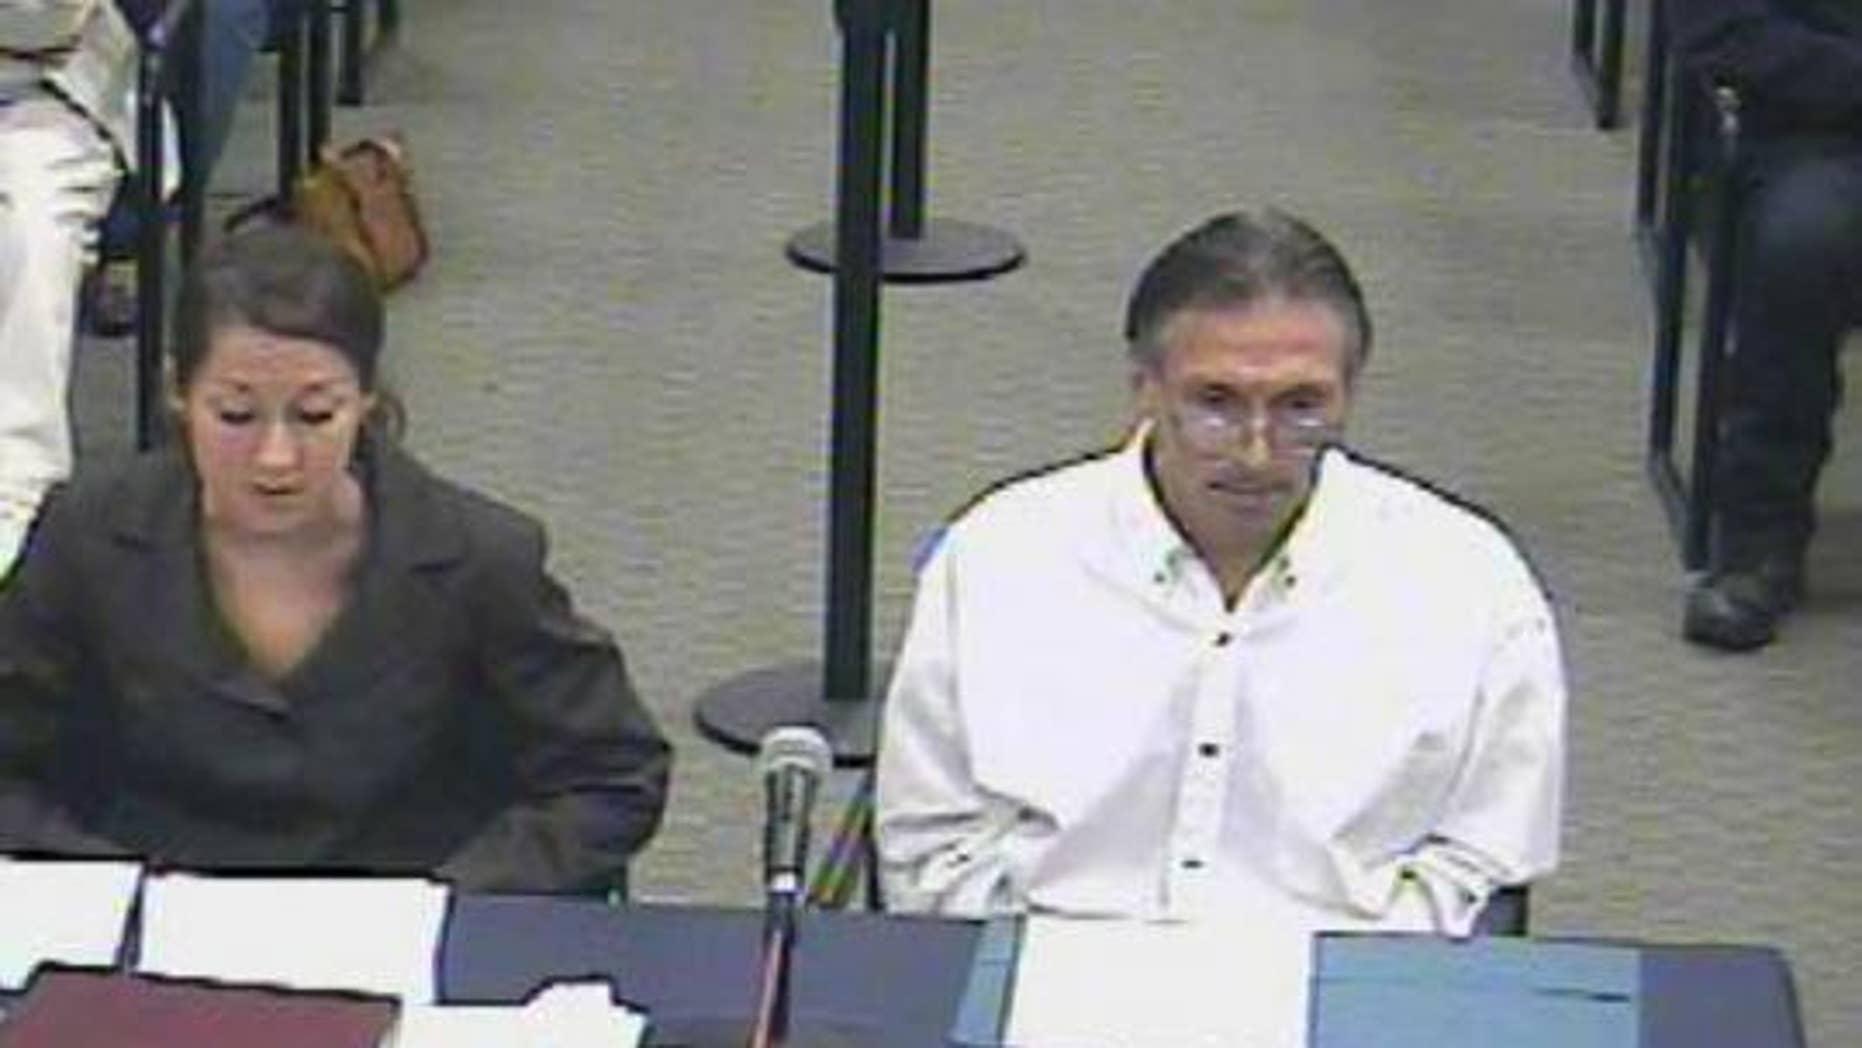 Oct. 2008: Dominic Cinelli tells Massachusetts Parole Board he's a changed man.